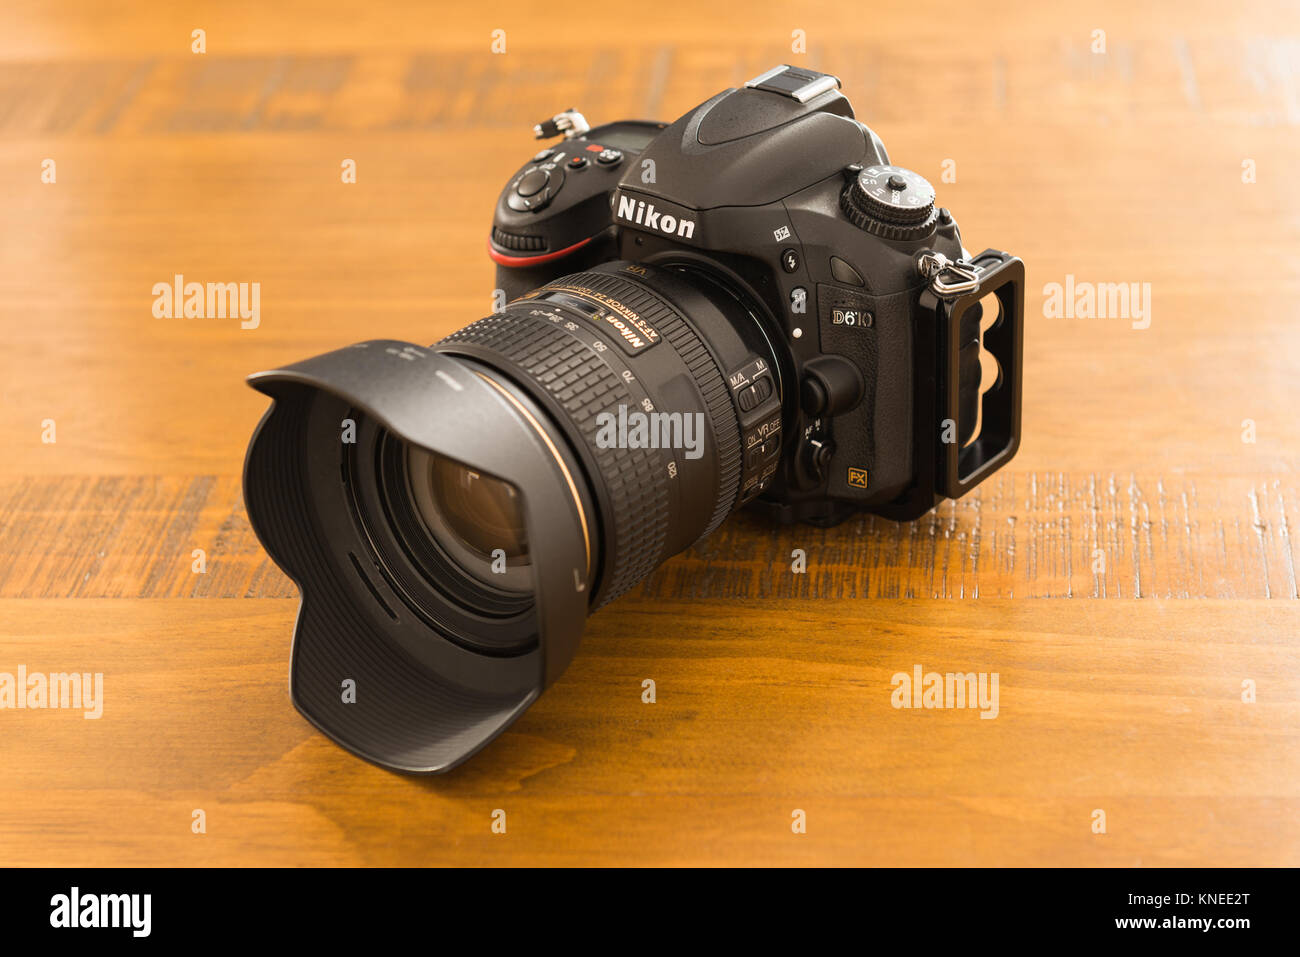 Largs,Scotland,UK-December 01, 2017: Nikon D610 Camera with 24-120mm F4 lens sitting on wooden oak table taken in - Stock Image